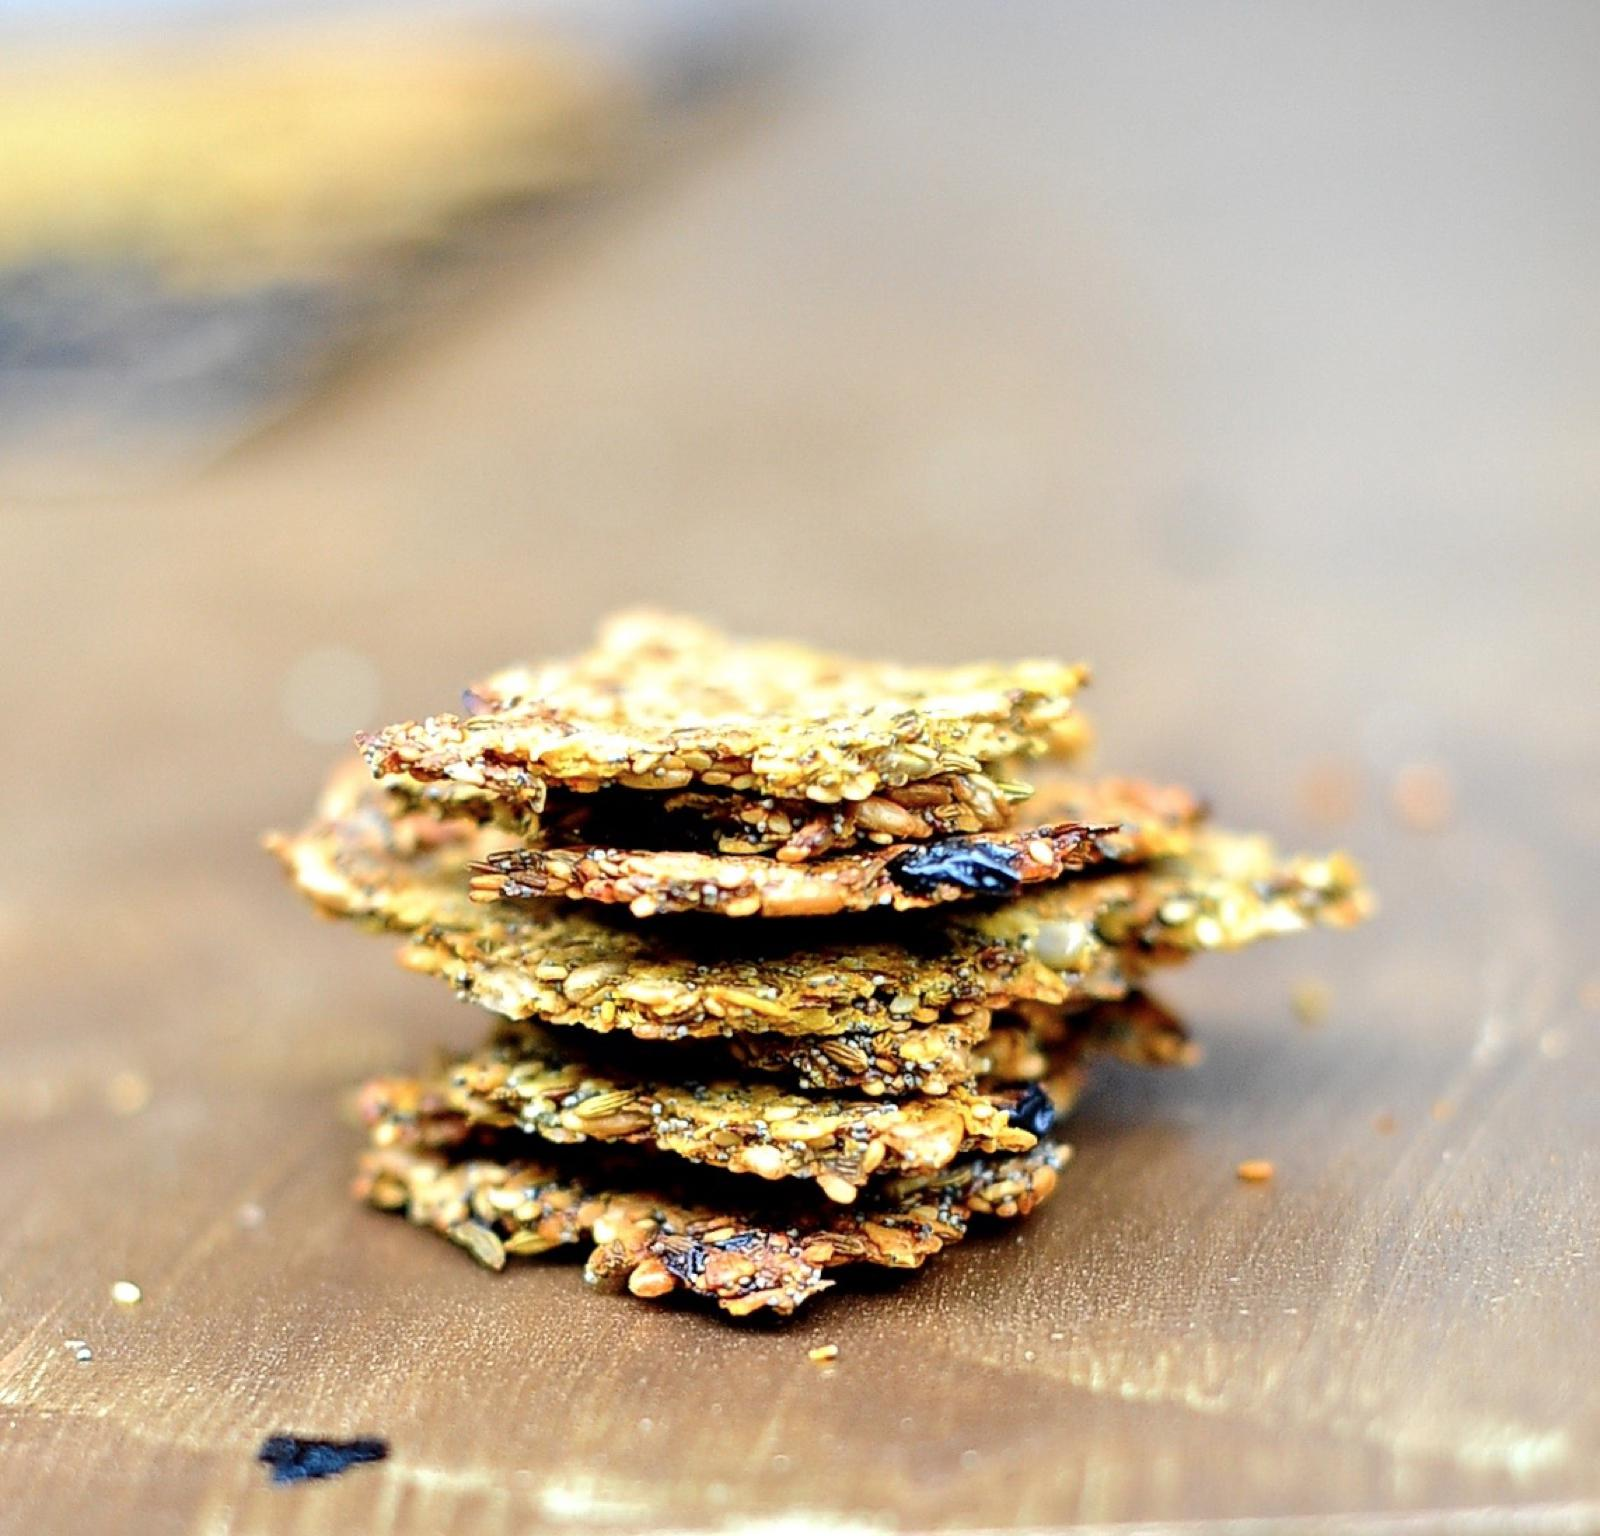 johanne's crackers